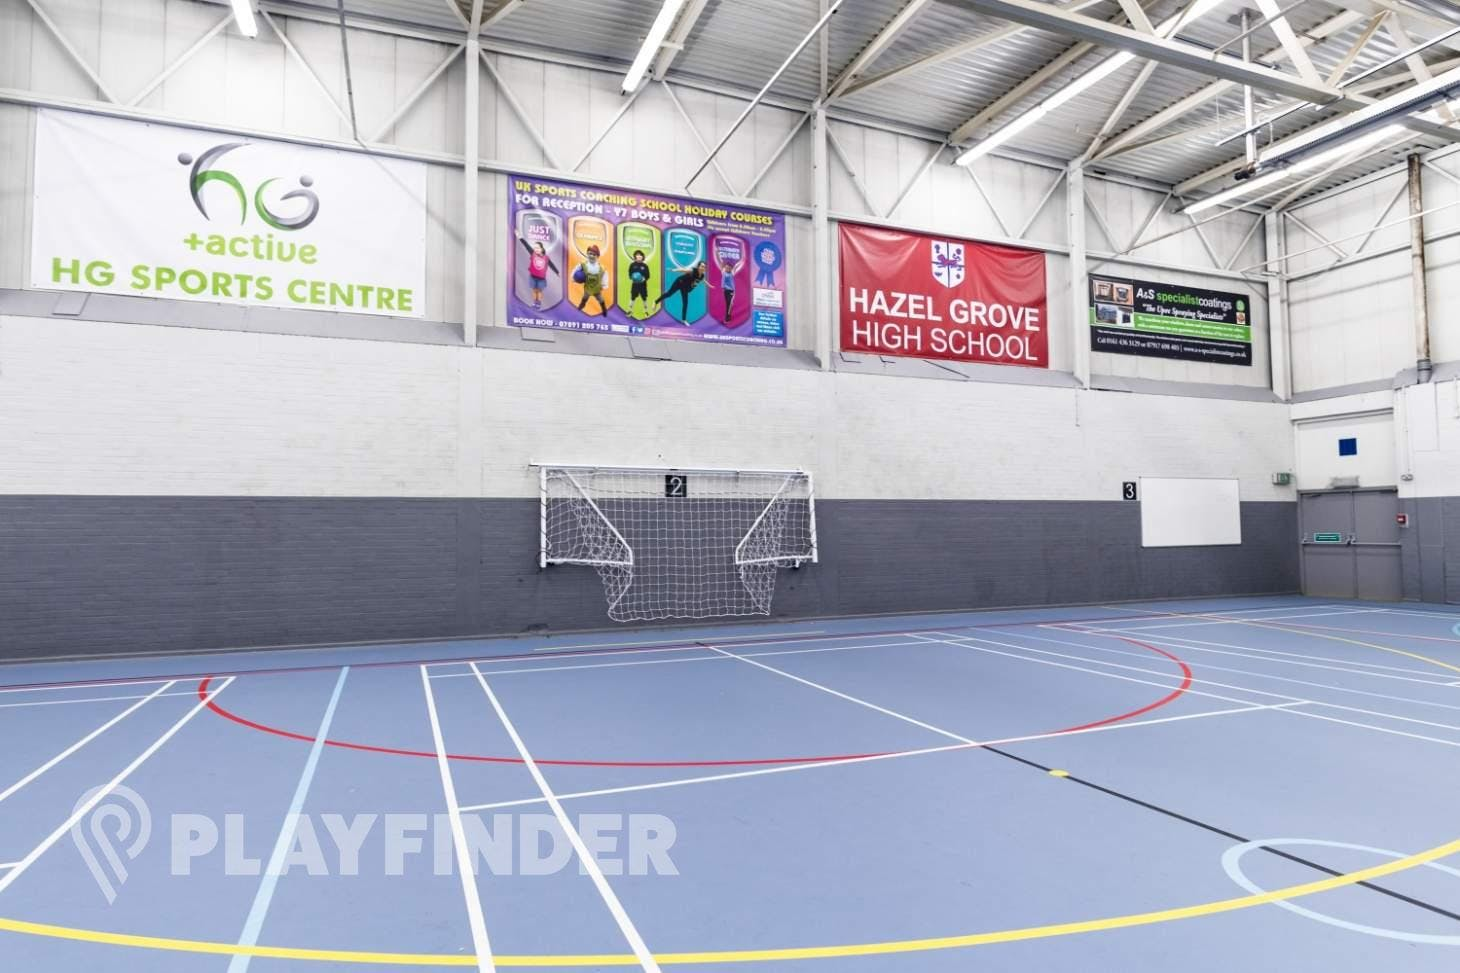 Hazel Grove Sports Centre